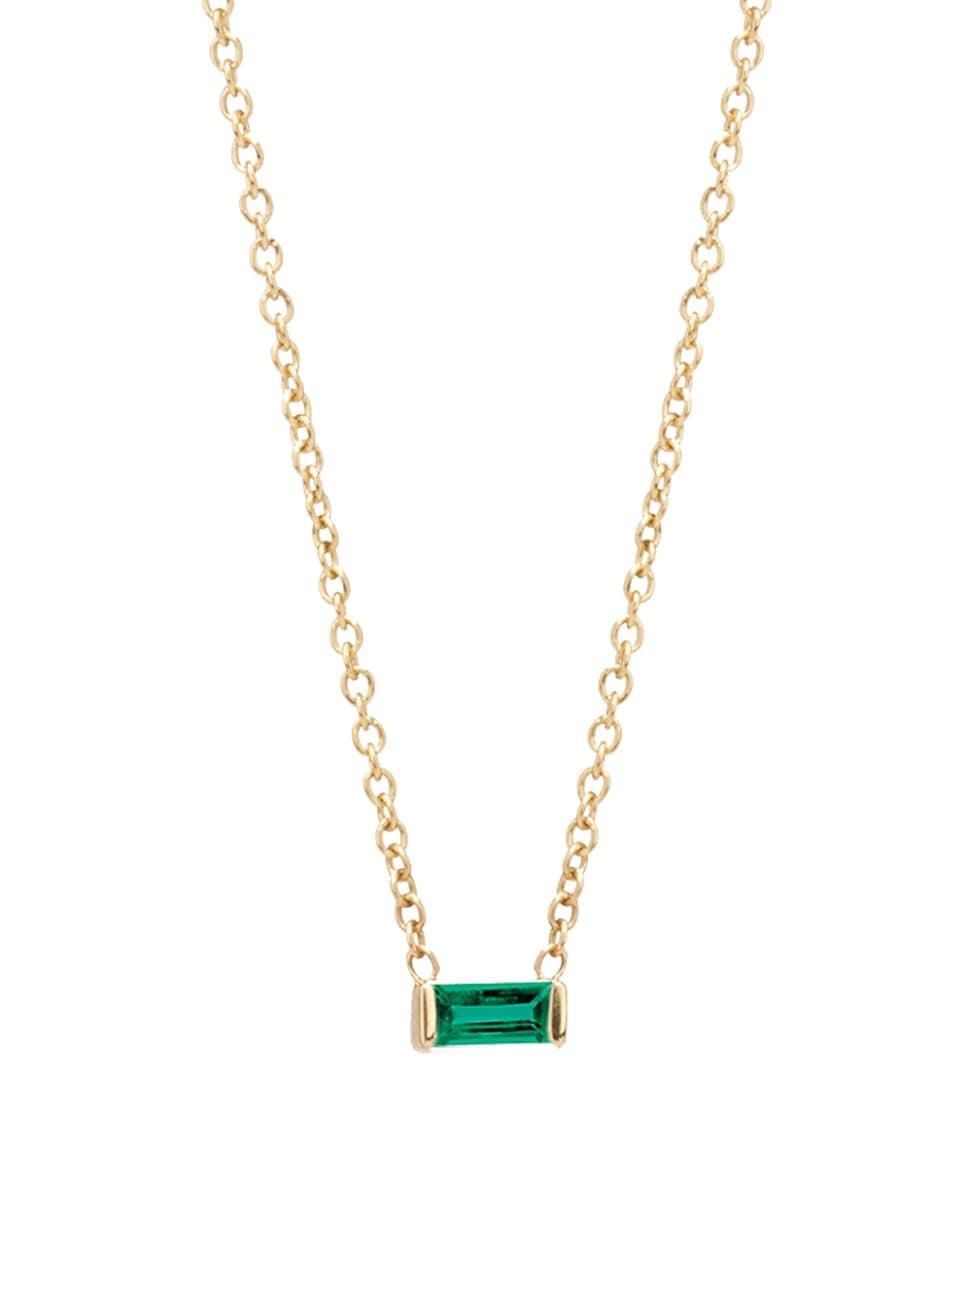 Zoë Chicco Women's Birthstones 14k Yellow Gold & Emerald Horizontal Baguette Necklace